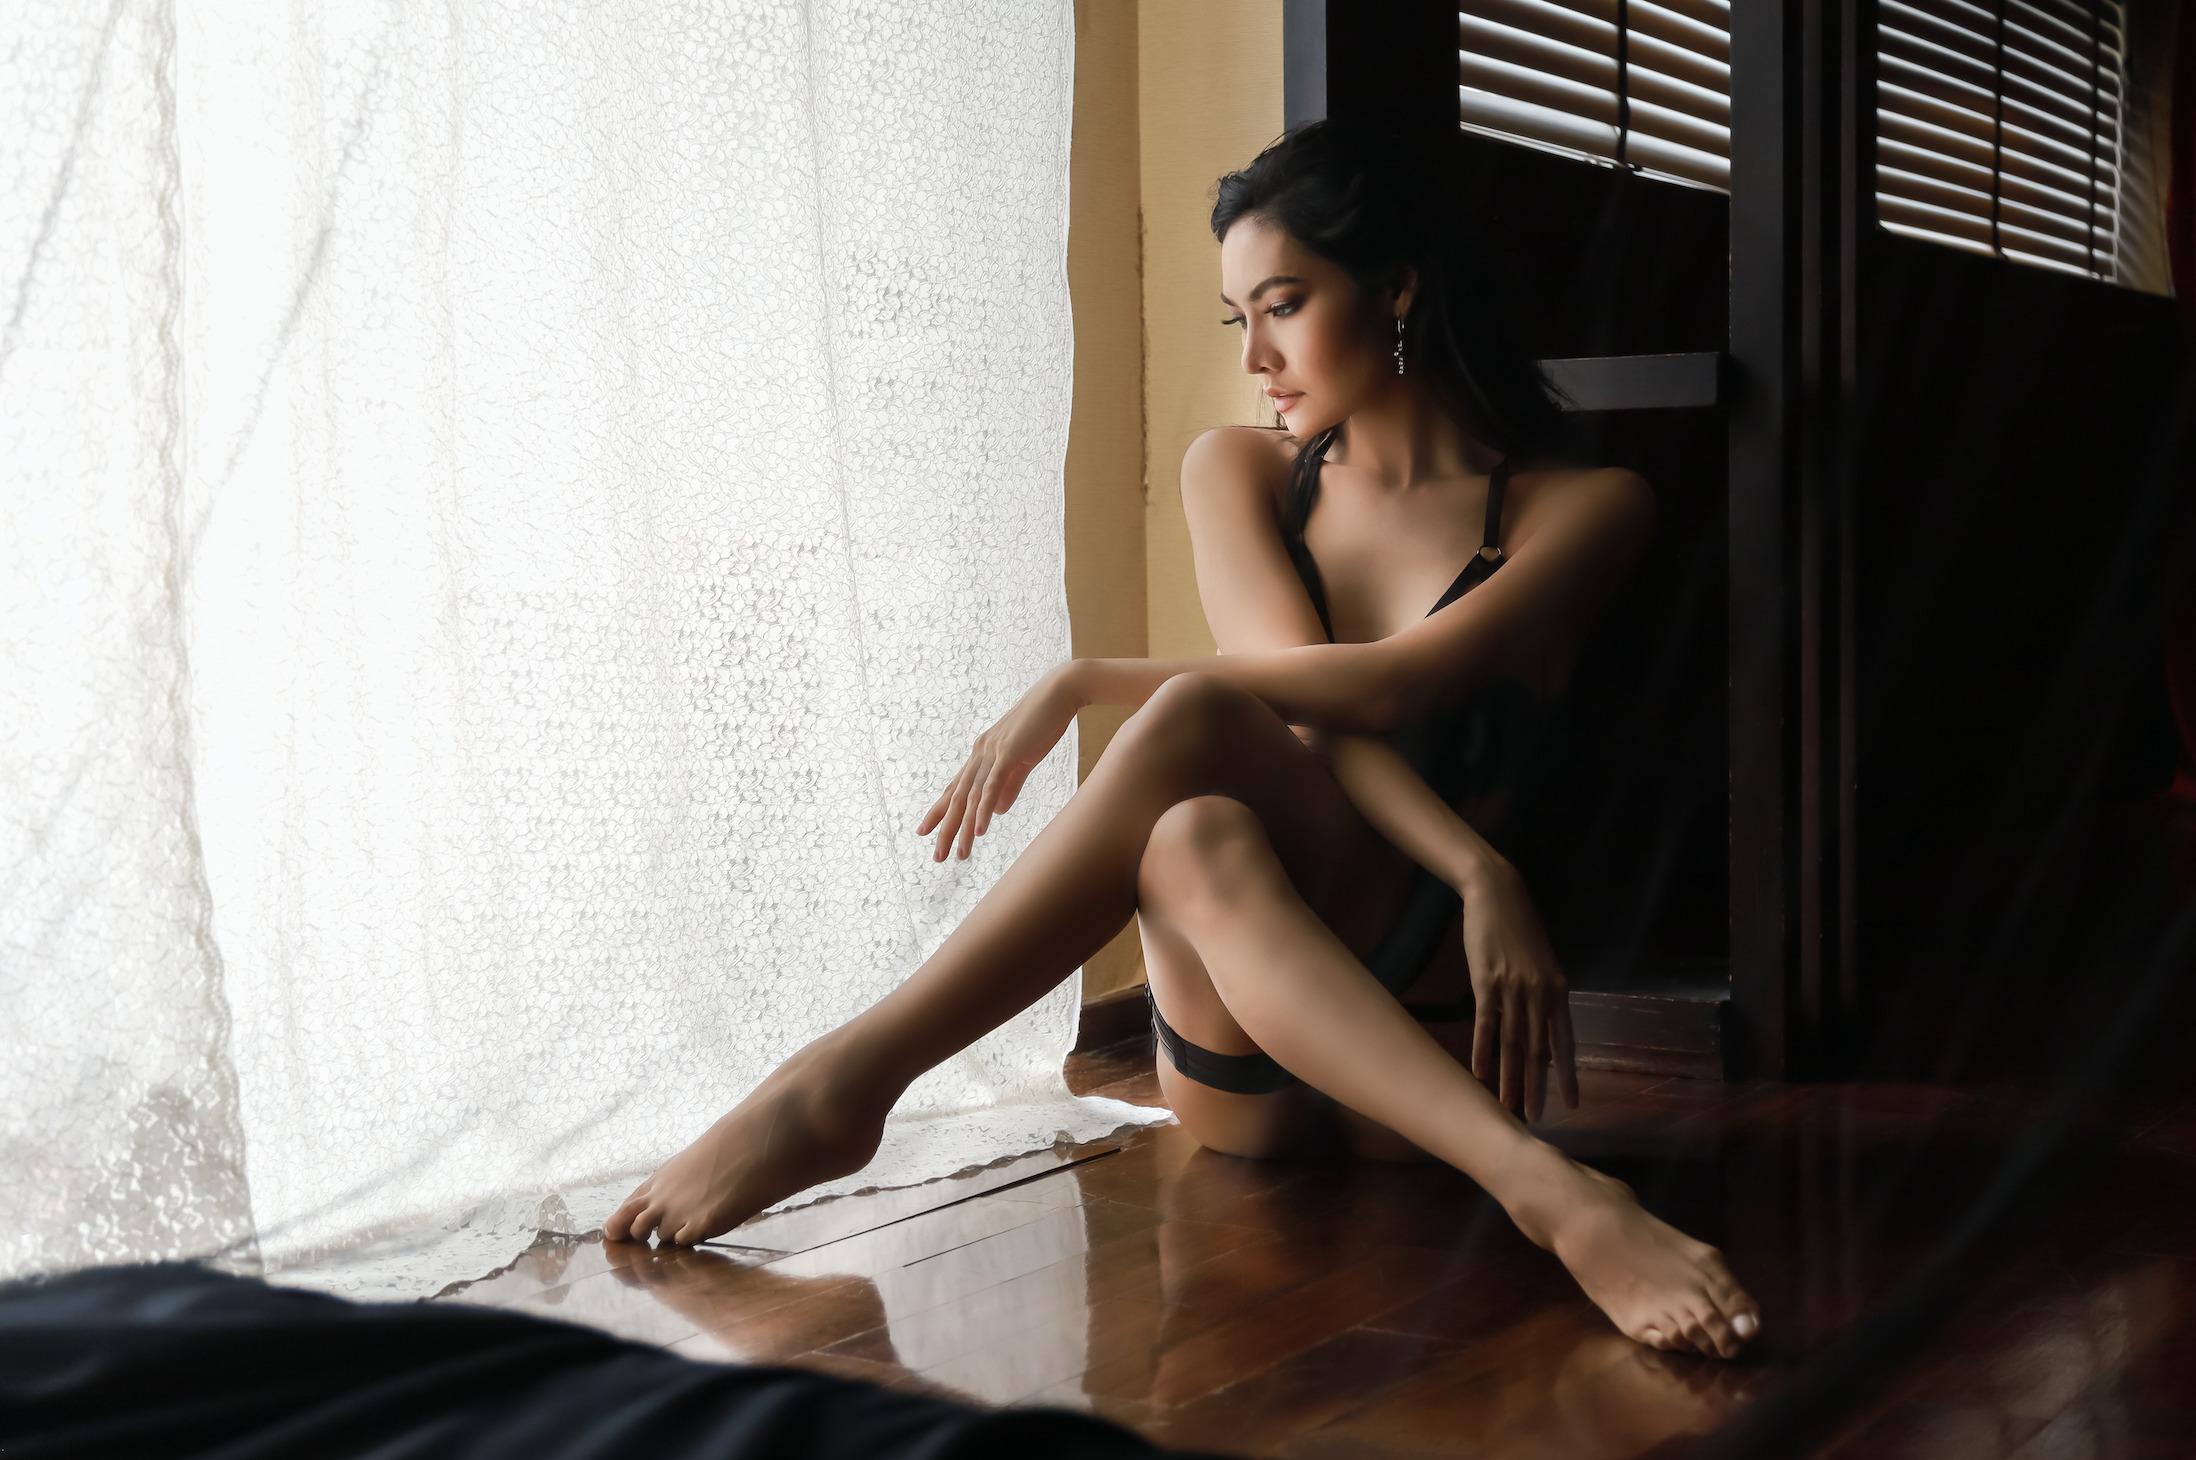 How to Book Verified Massage Therapist for Nuru